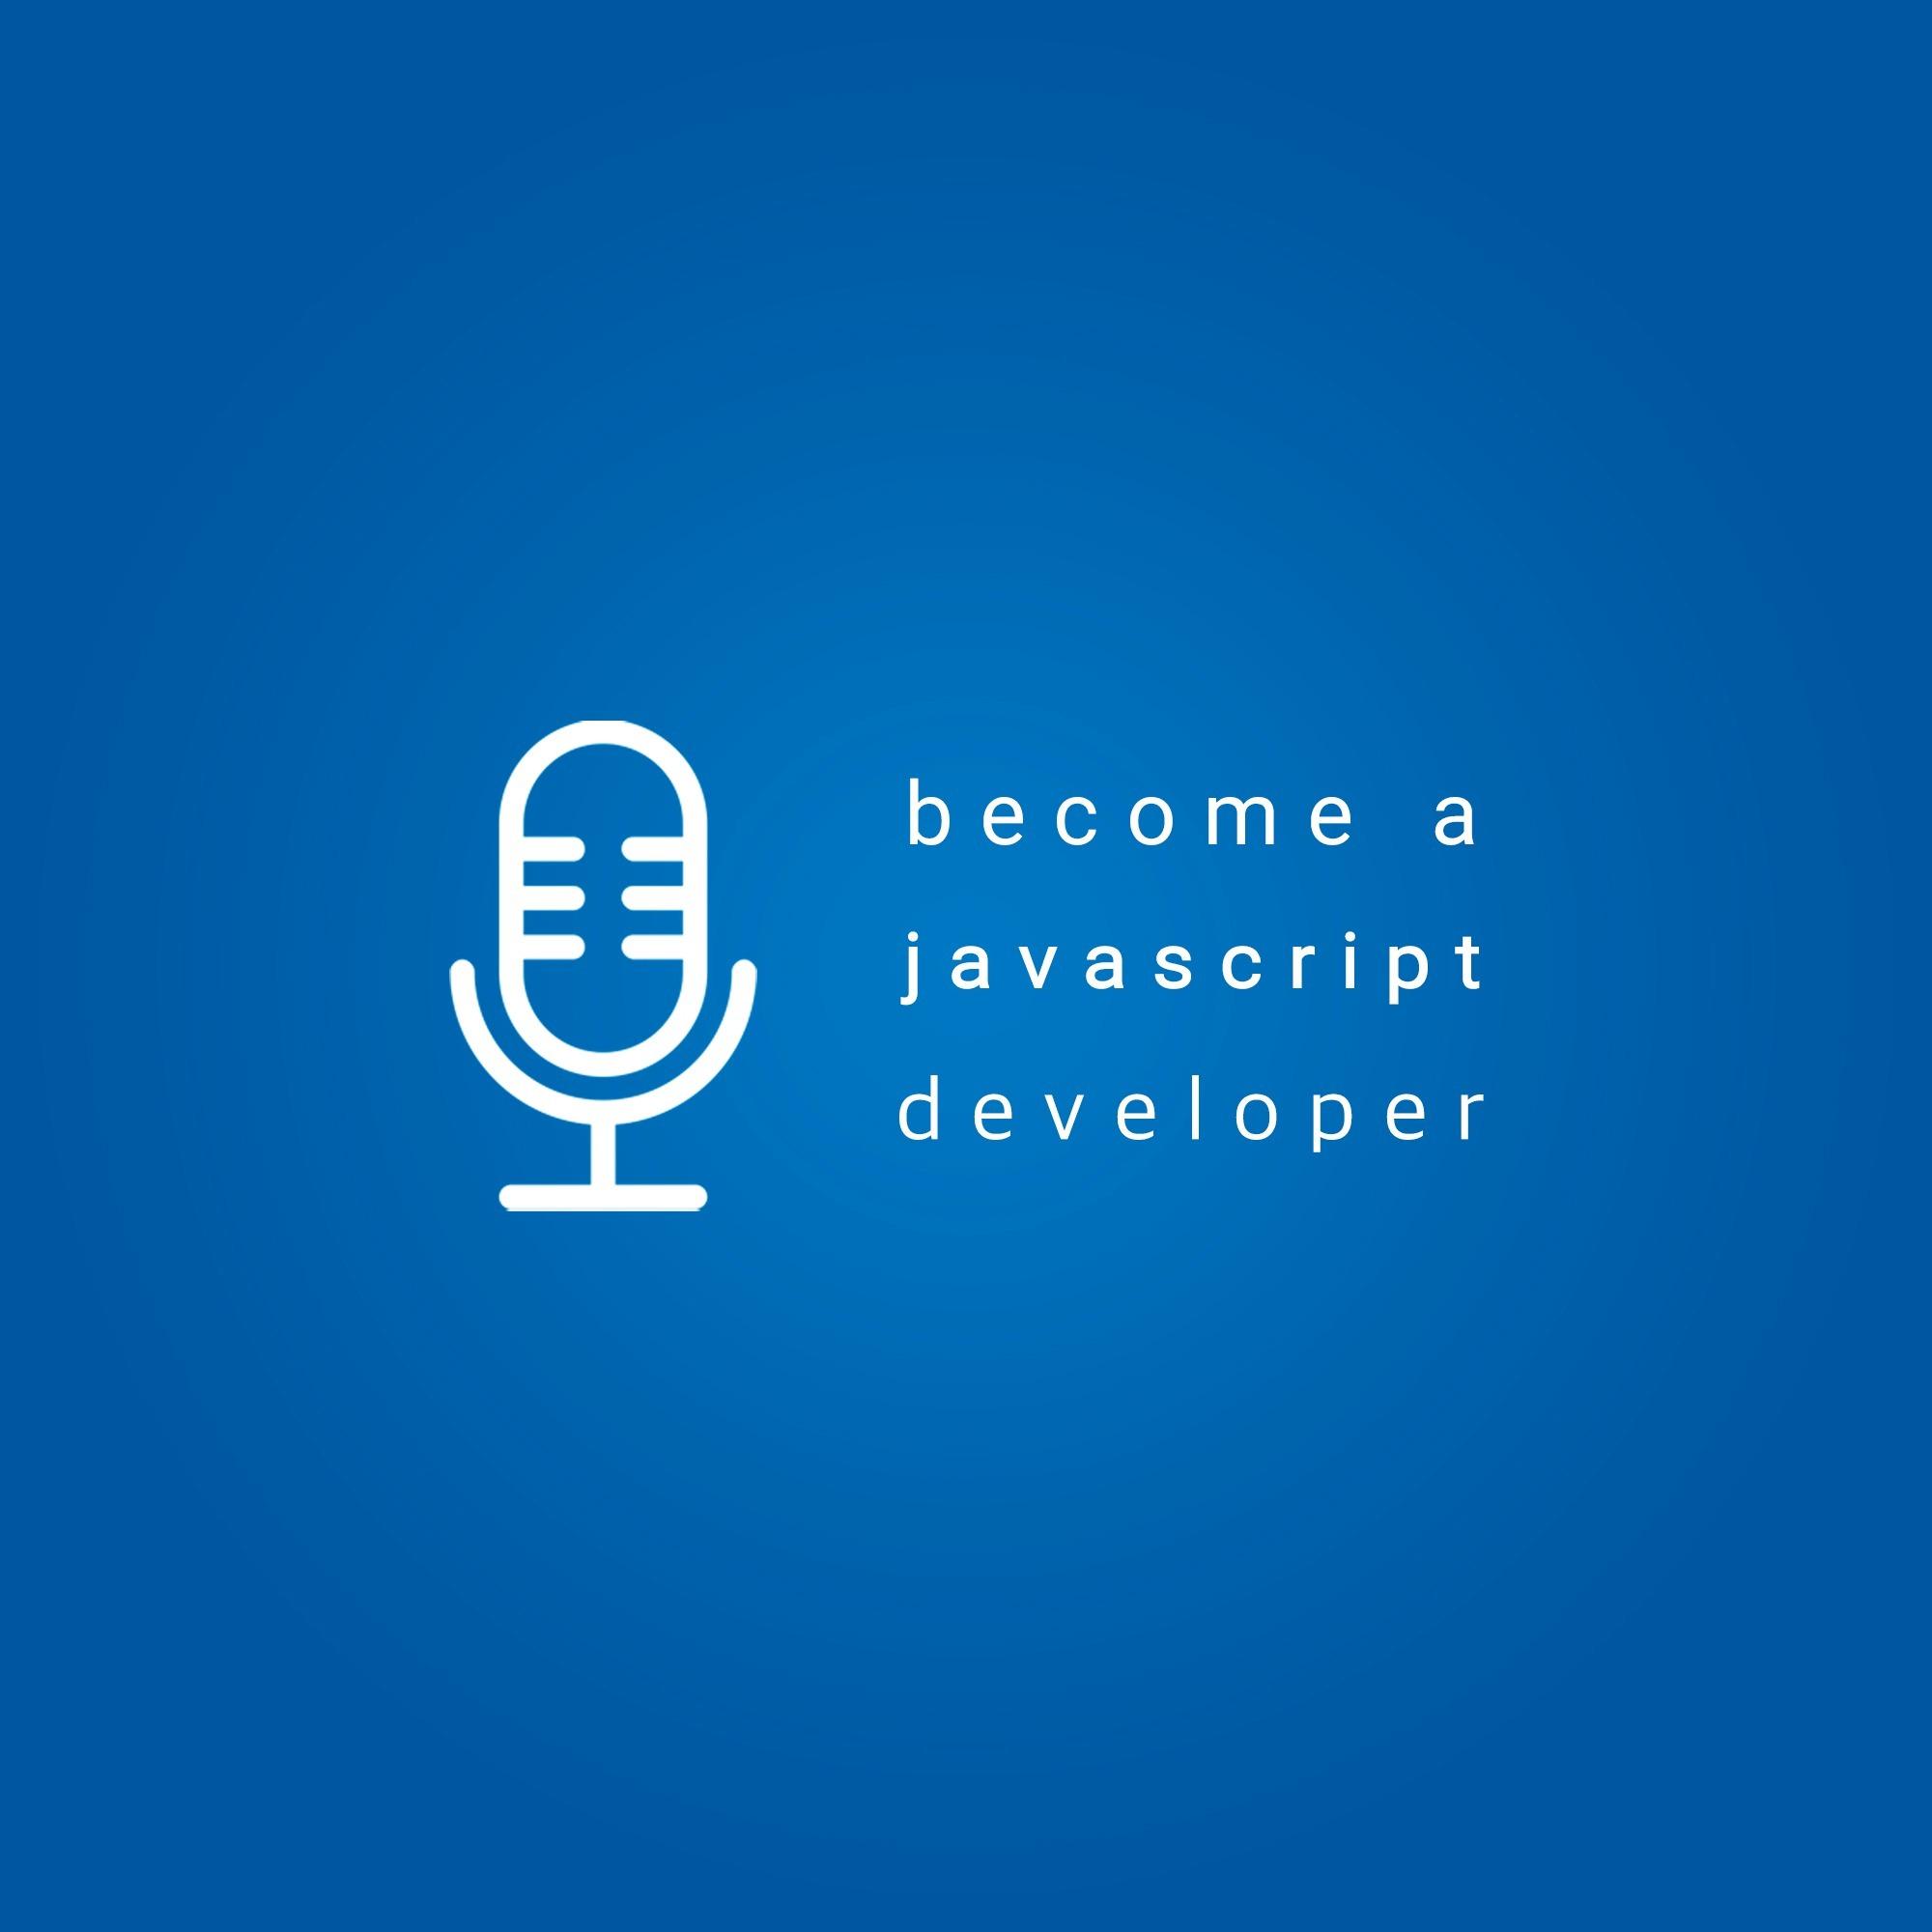 Become a JavasSript Developer